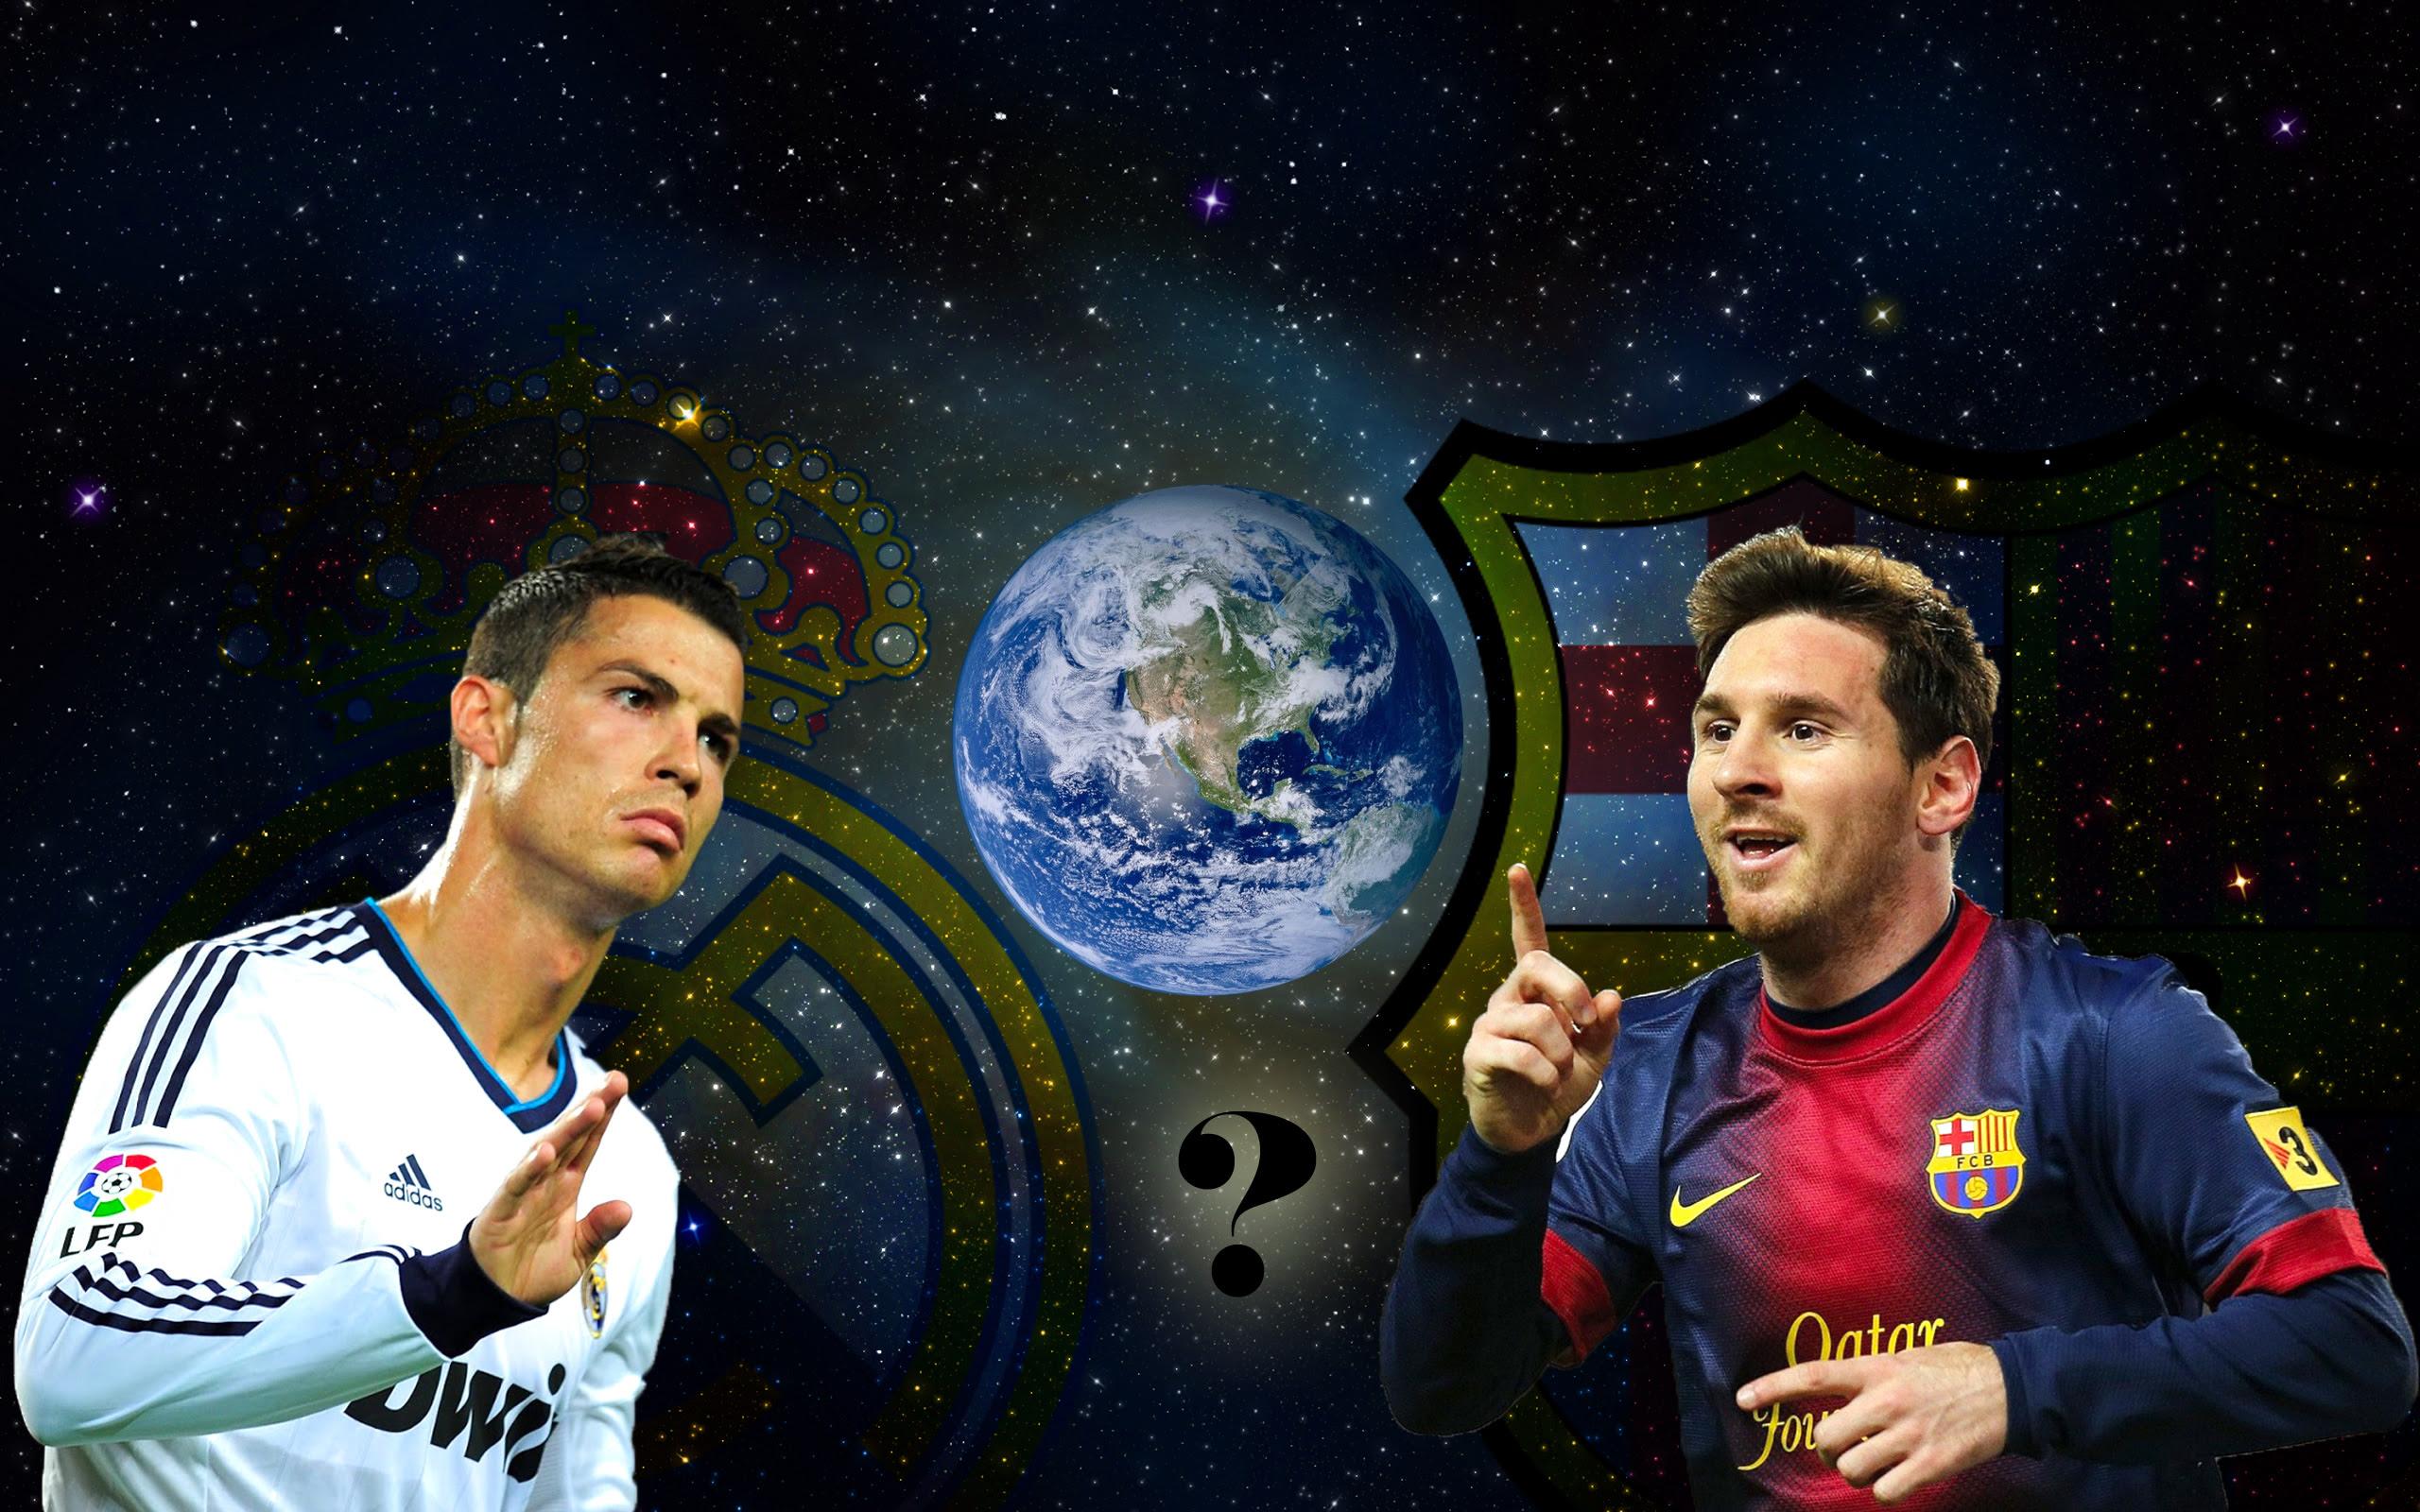 Messi Vs Ronaldo Wallpaper Hd Football